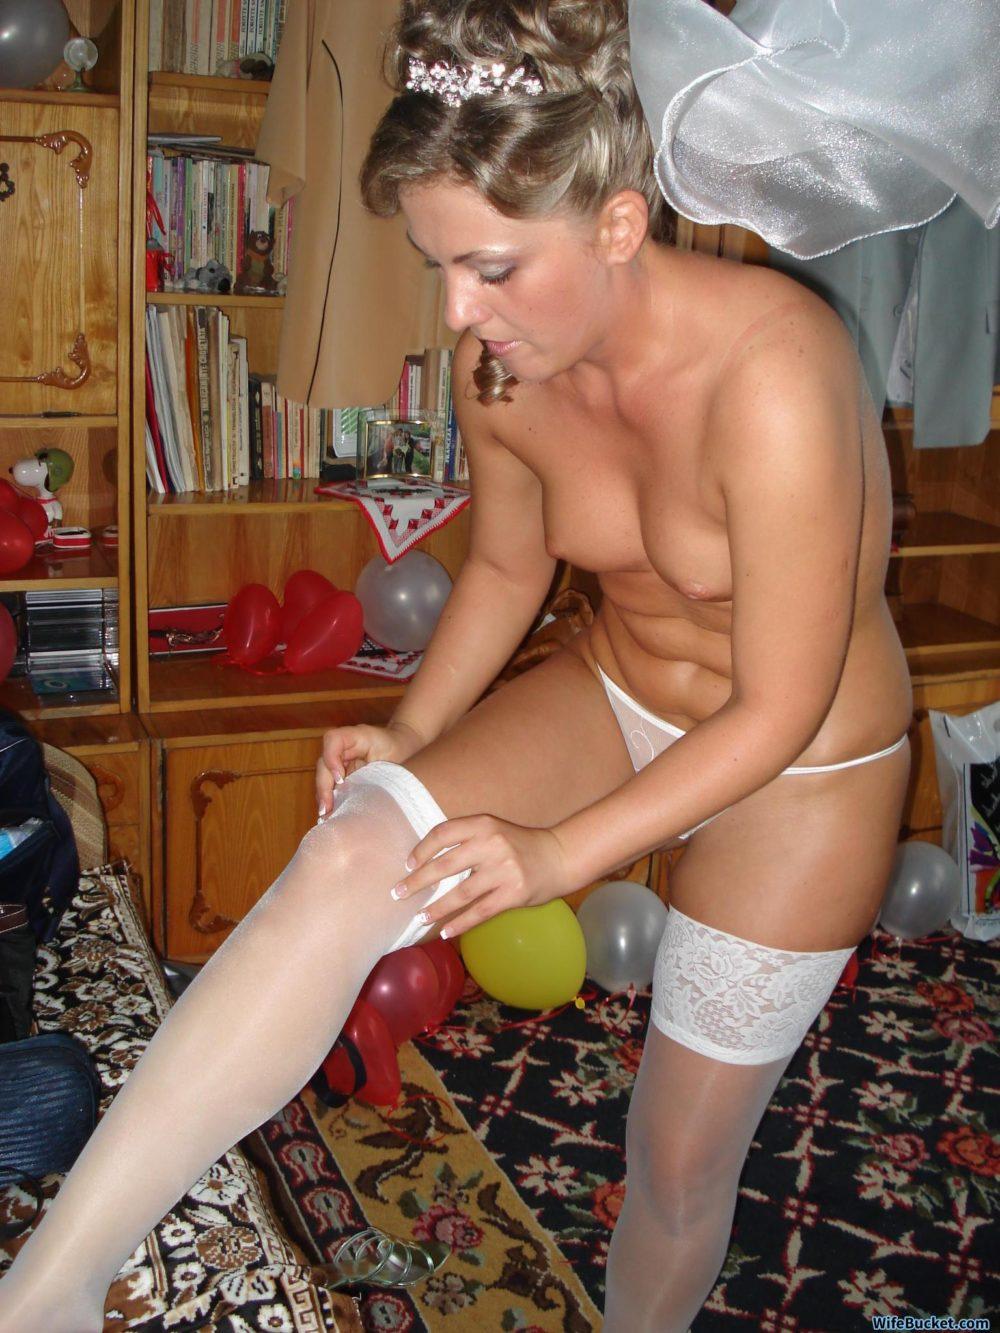 Bride nudity pics